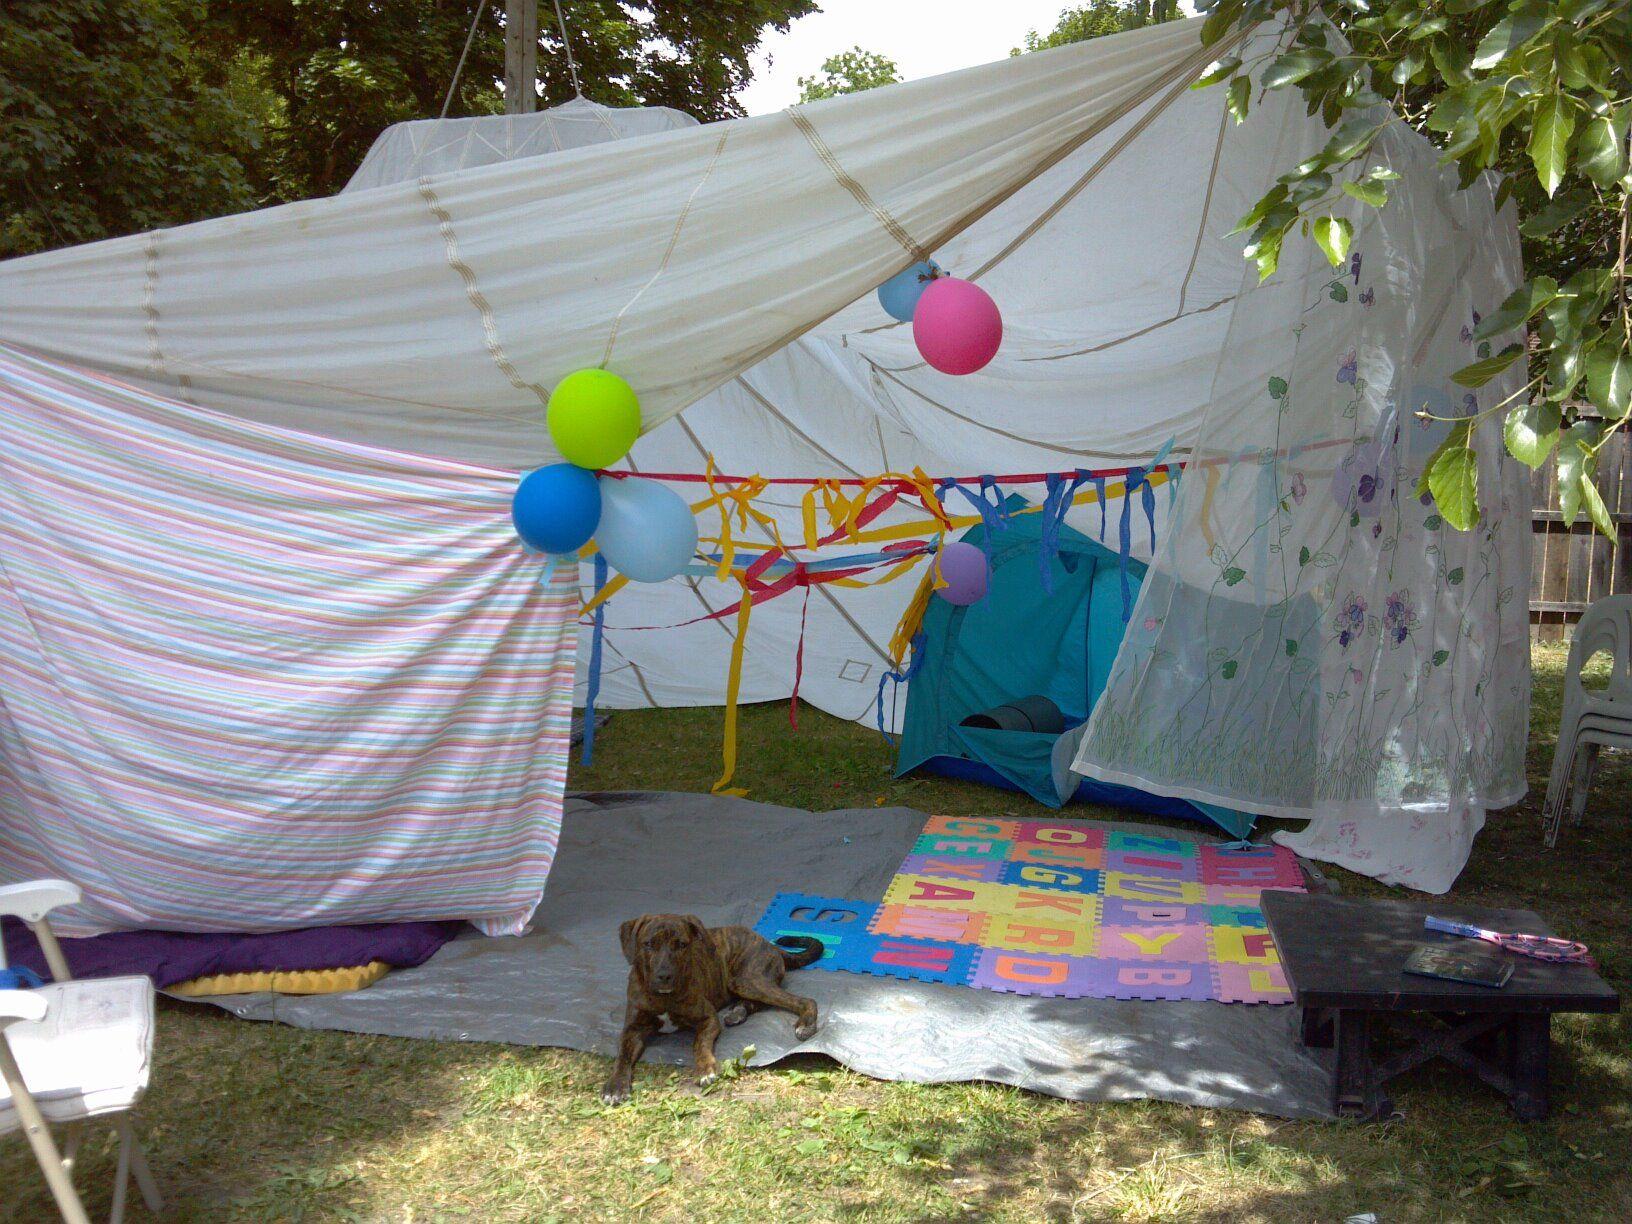 Parachute u0026 Sheet Tent w. & Parachute u0026 Sheet Tent w.puppy :) | Everything Sleepover ...